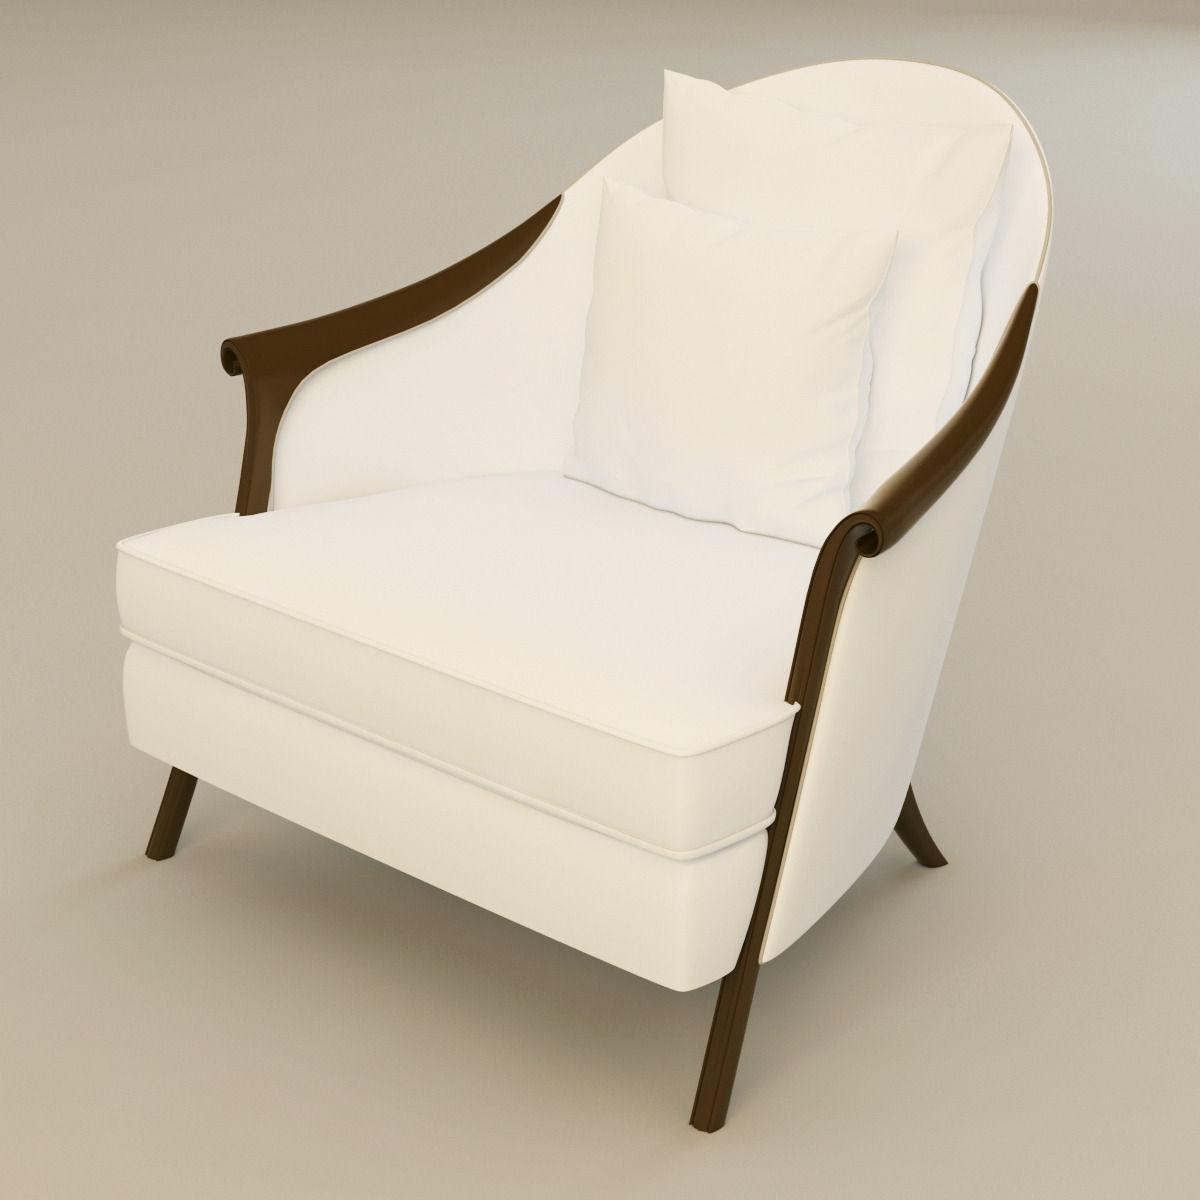 Christopher guy poltrona armchair 3d model max obj 3ds for Poltrona 3d